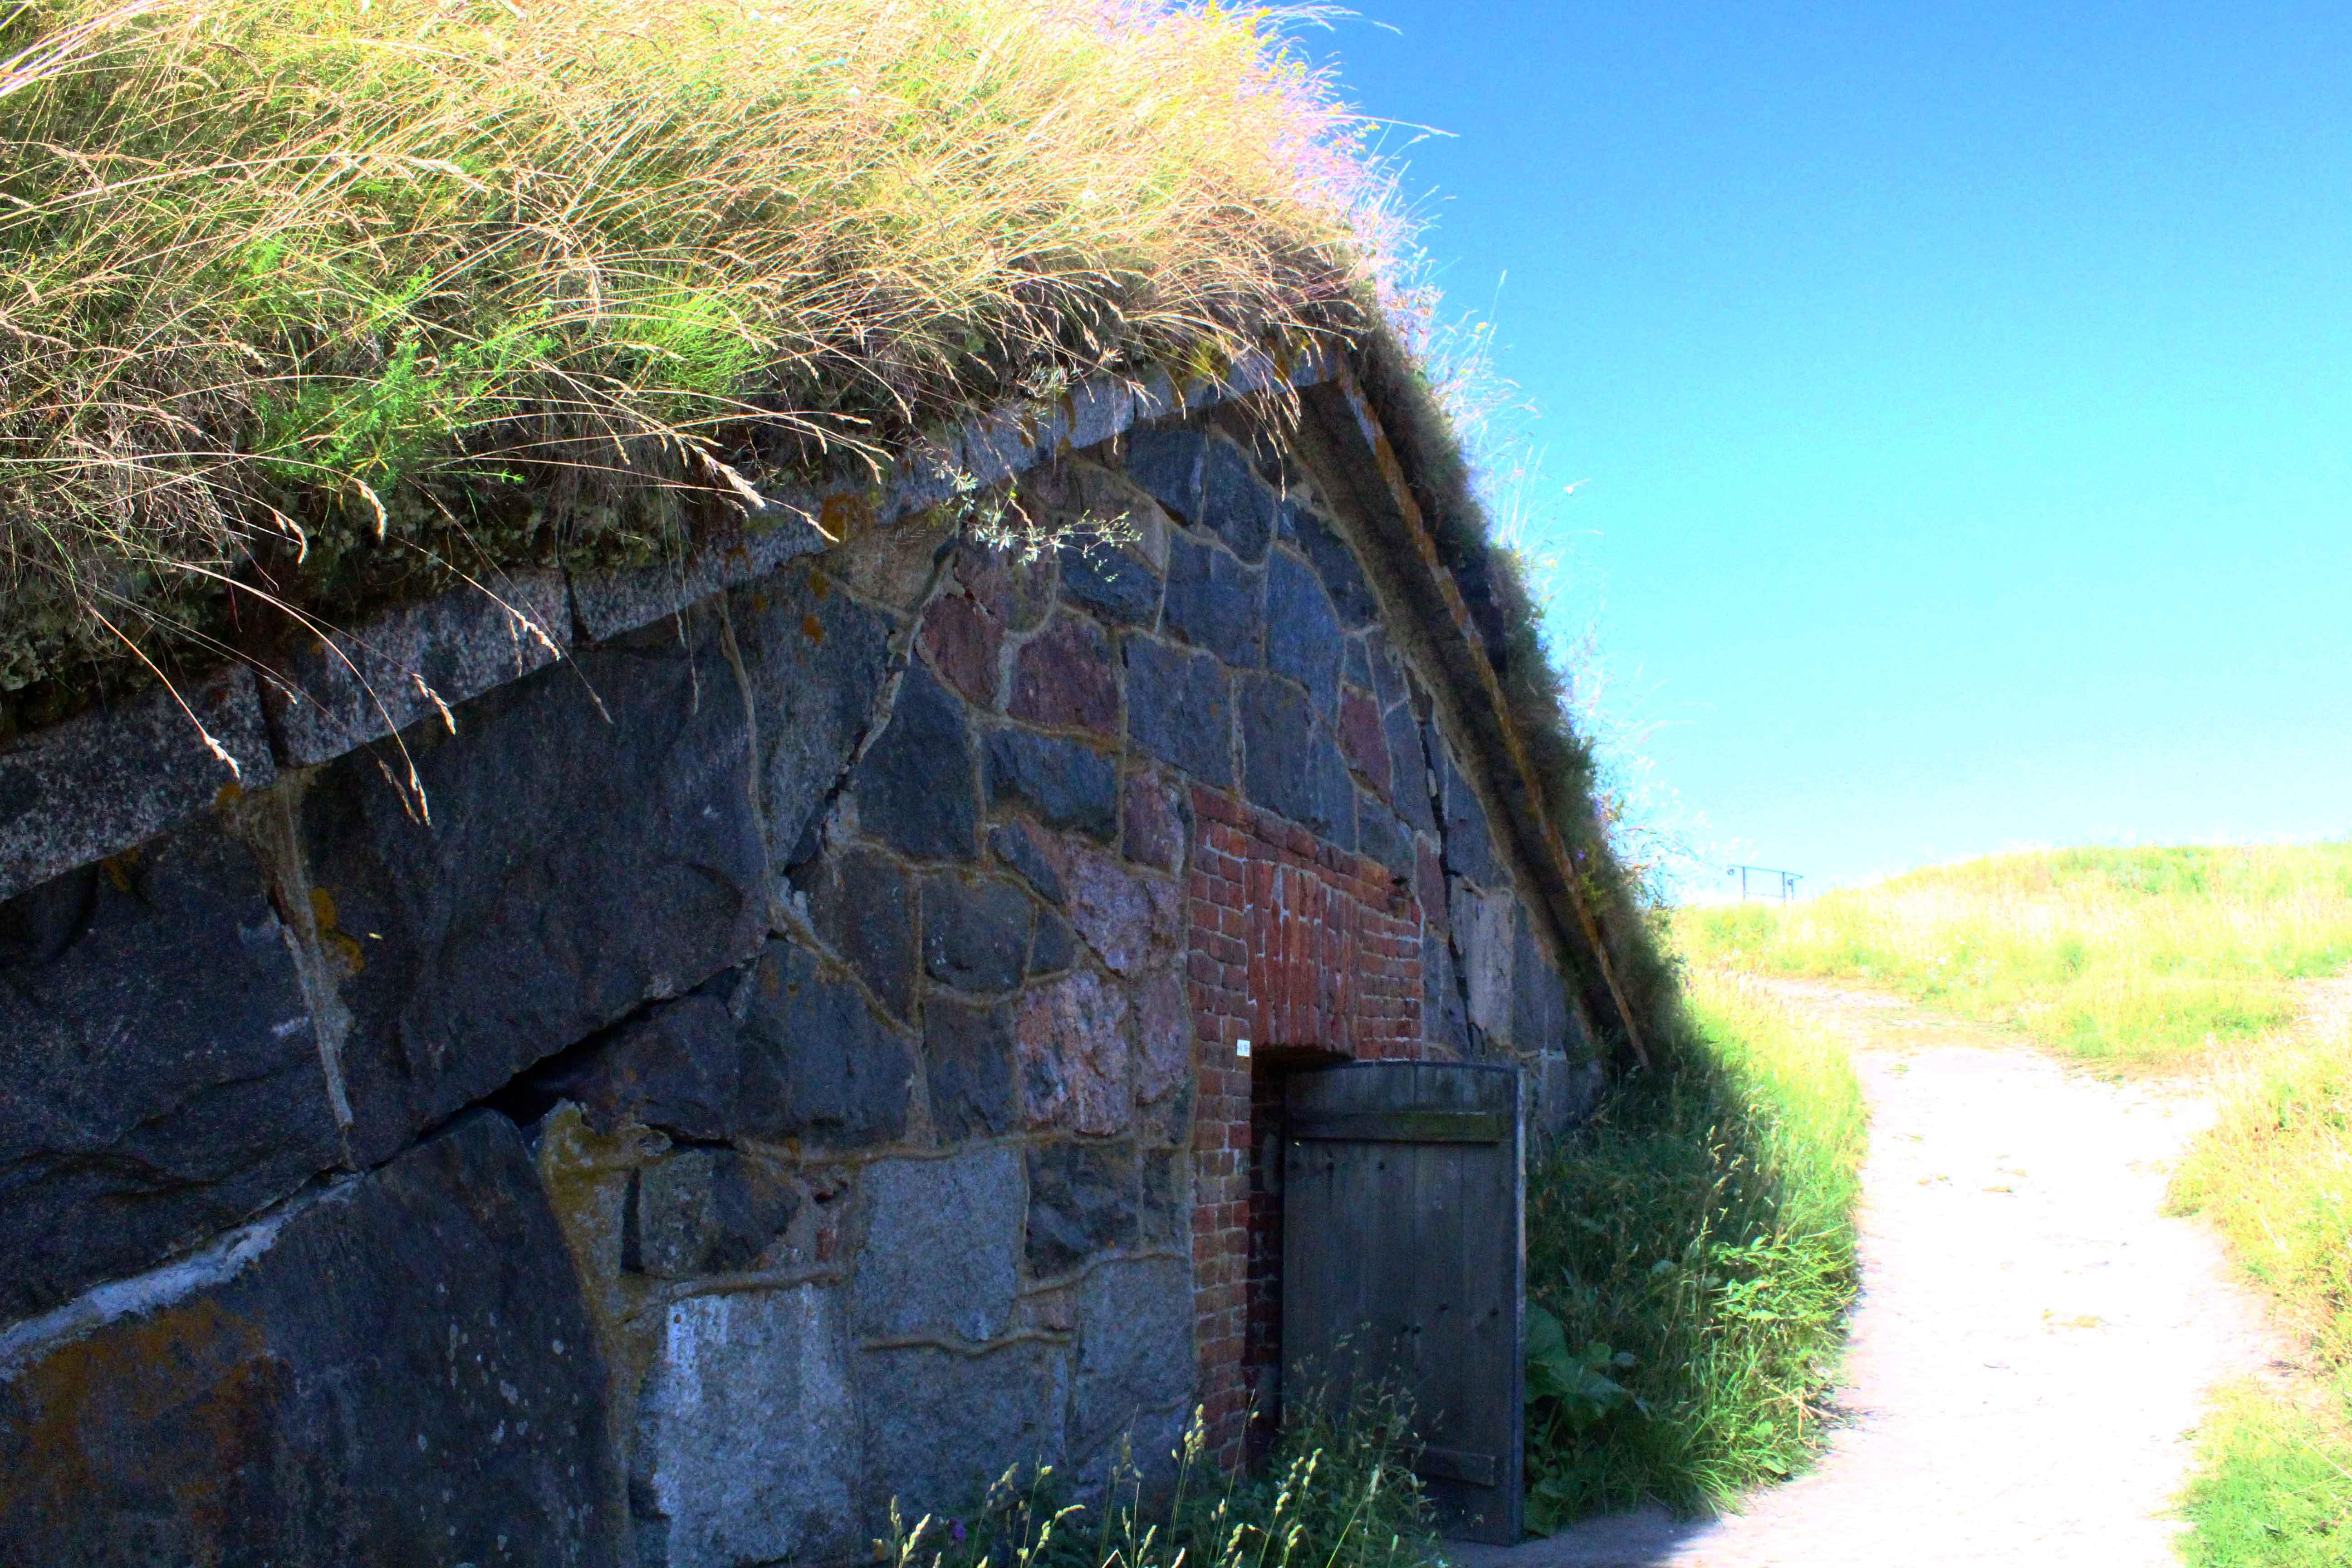 suomelinna-houses